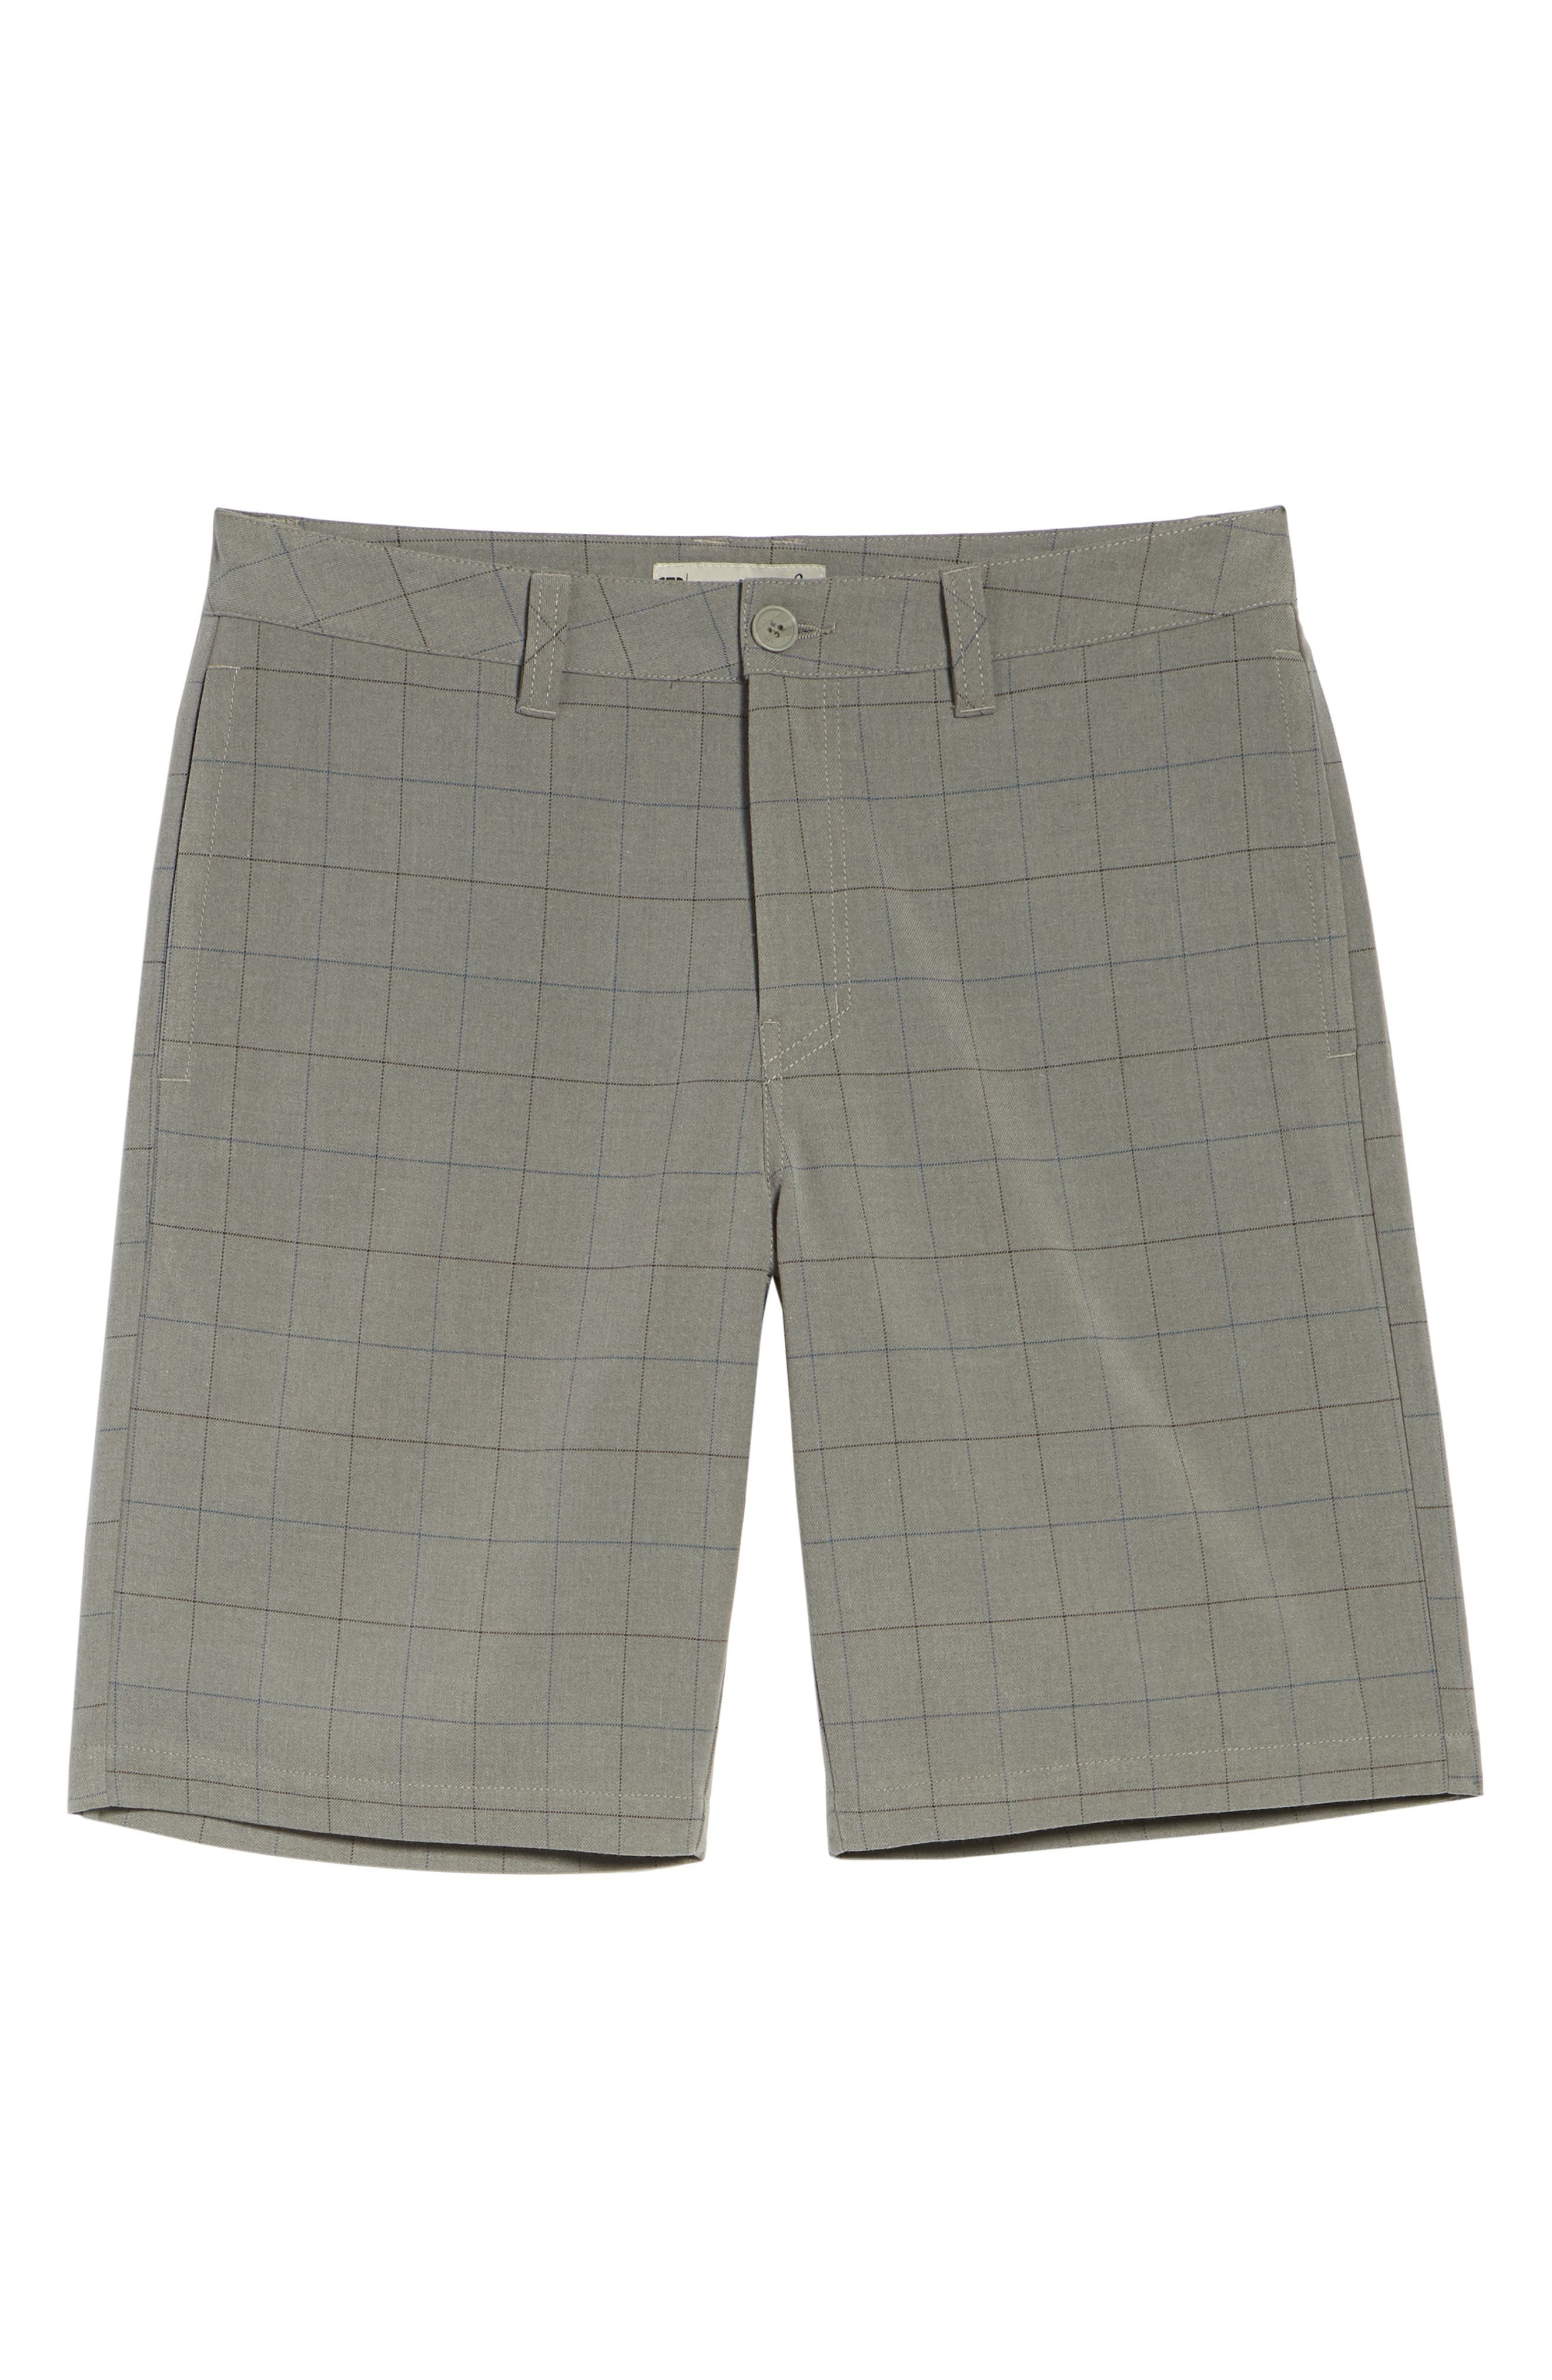 Rickles Regular Fit Shorts,                             Alternate thumbnail 6, color,                             020